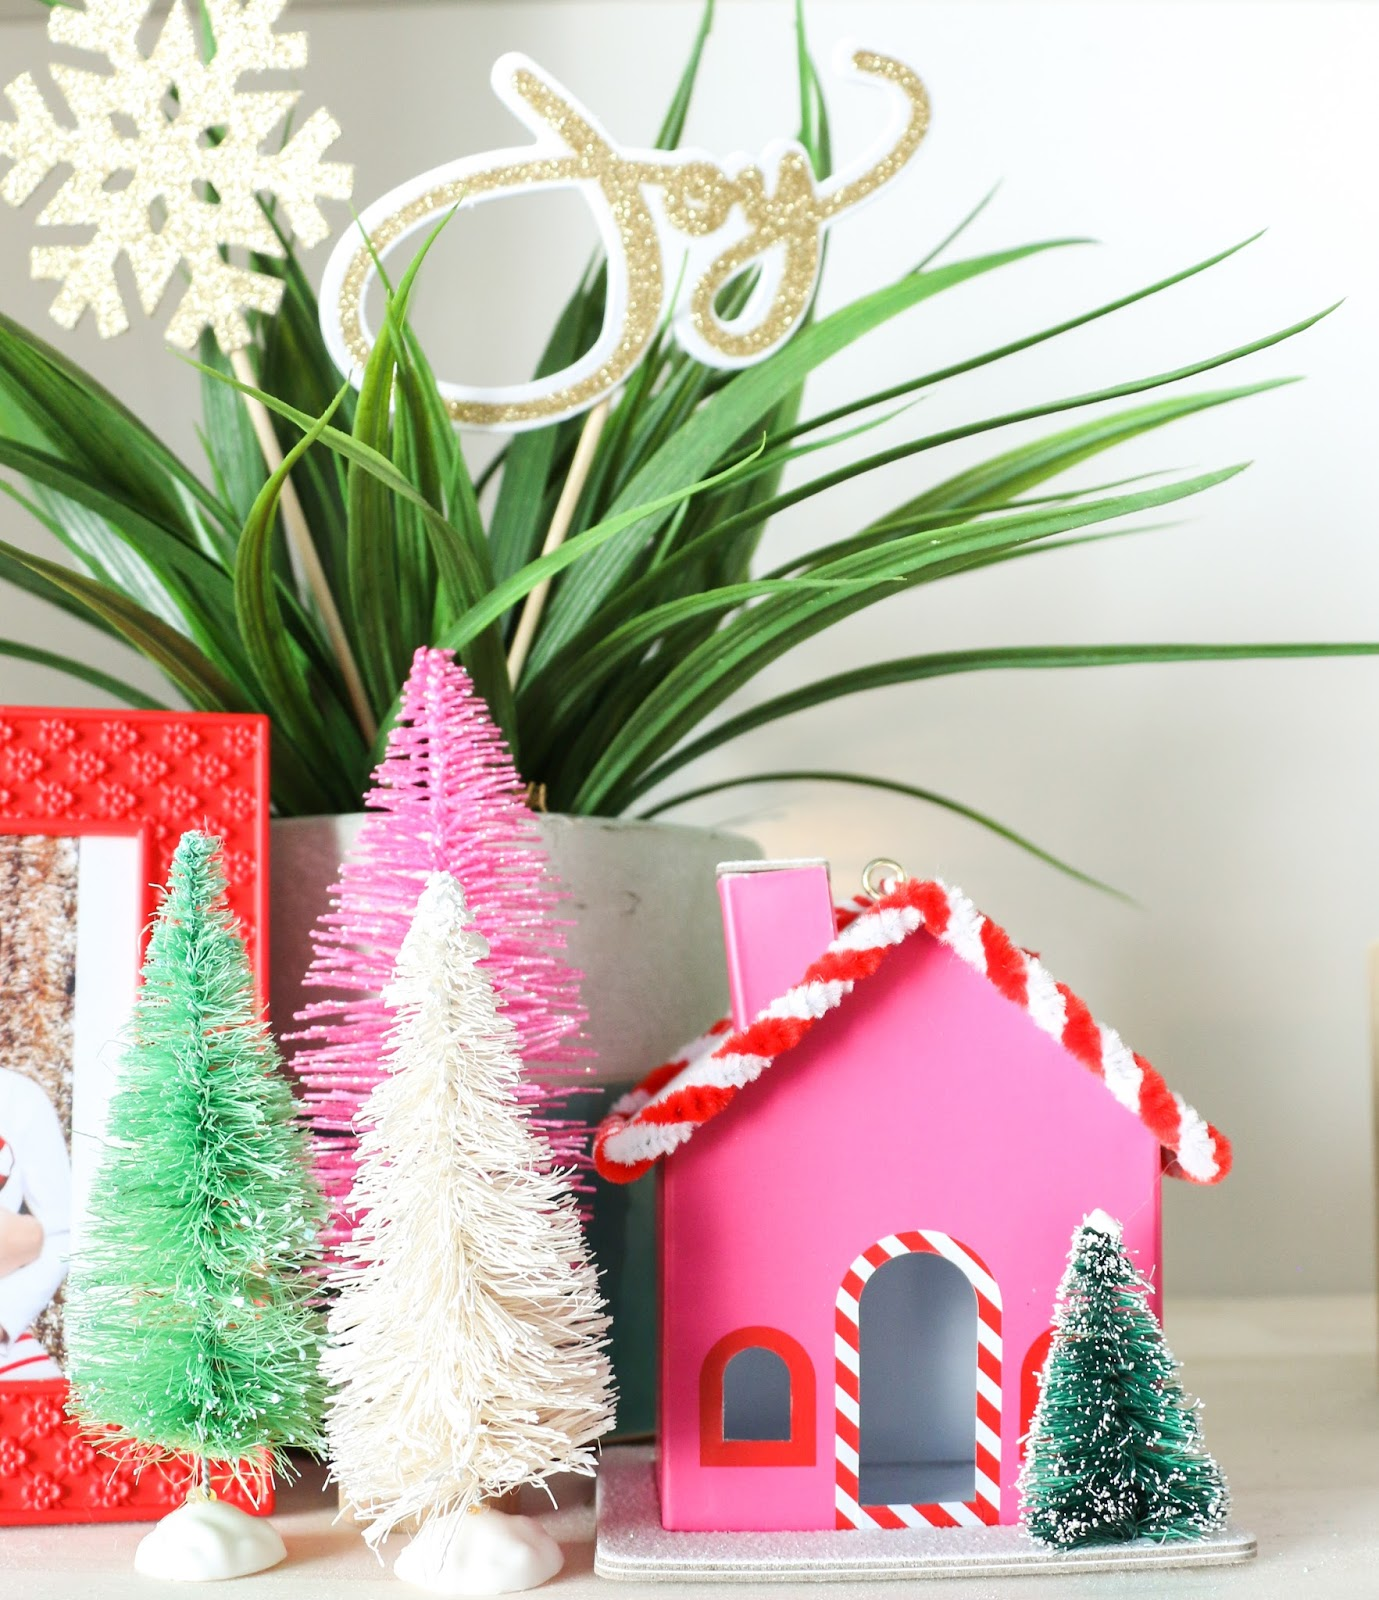 Christmas Home Tour Part 1 - The Built-ins - A Kailo Chic Life